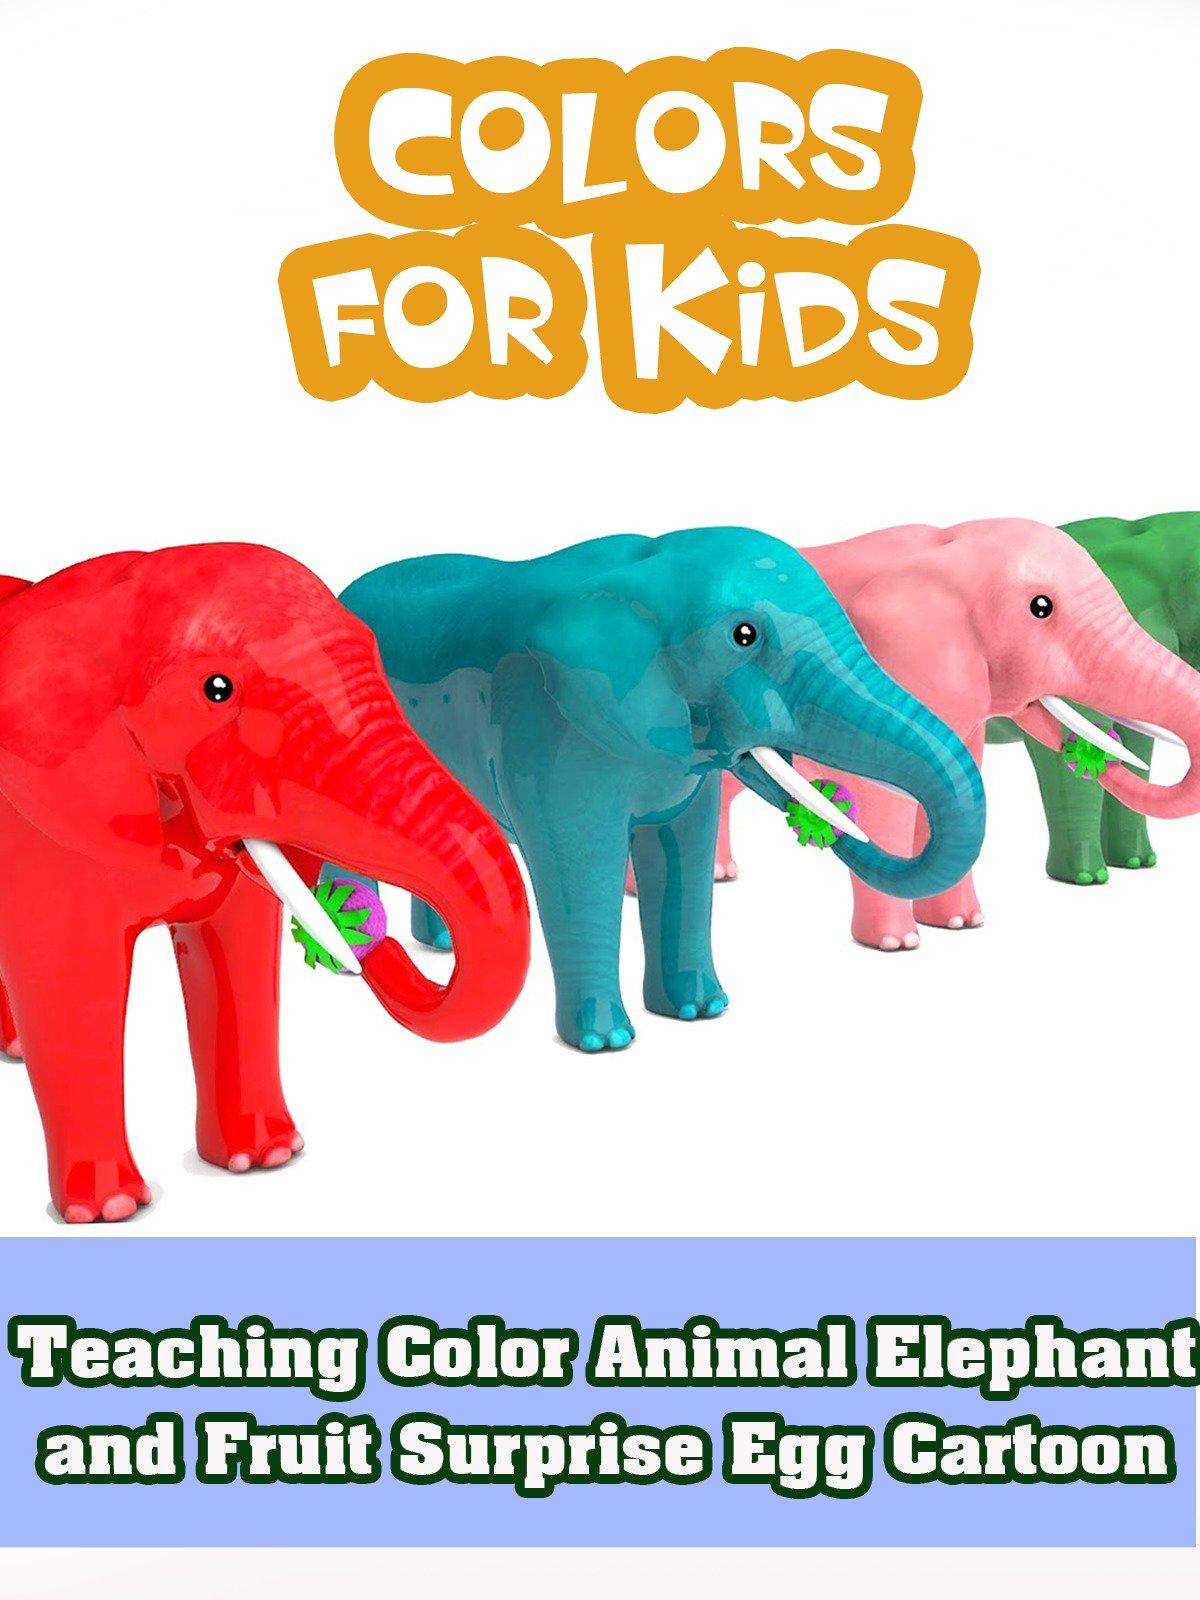 Teaching Color Animal Elephant and Fruit Surprise Egg Cartoon